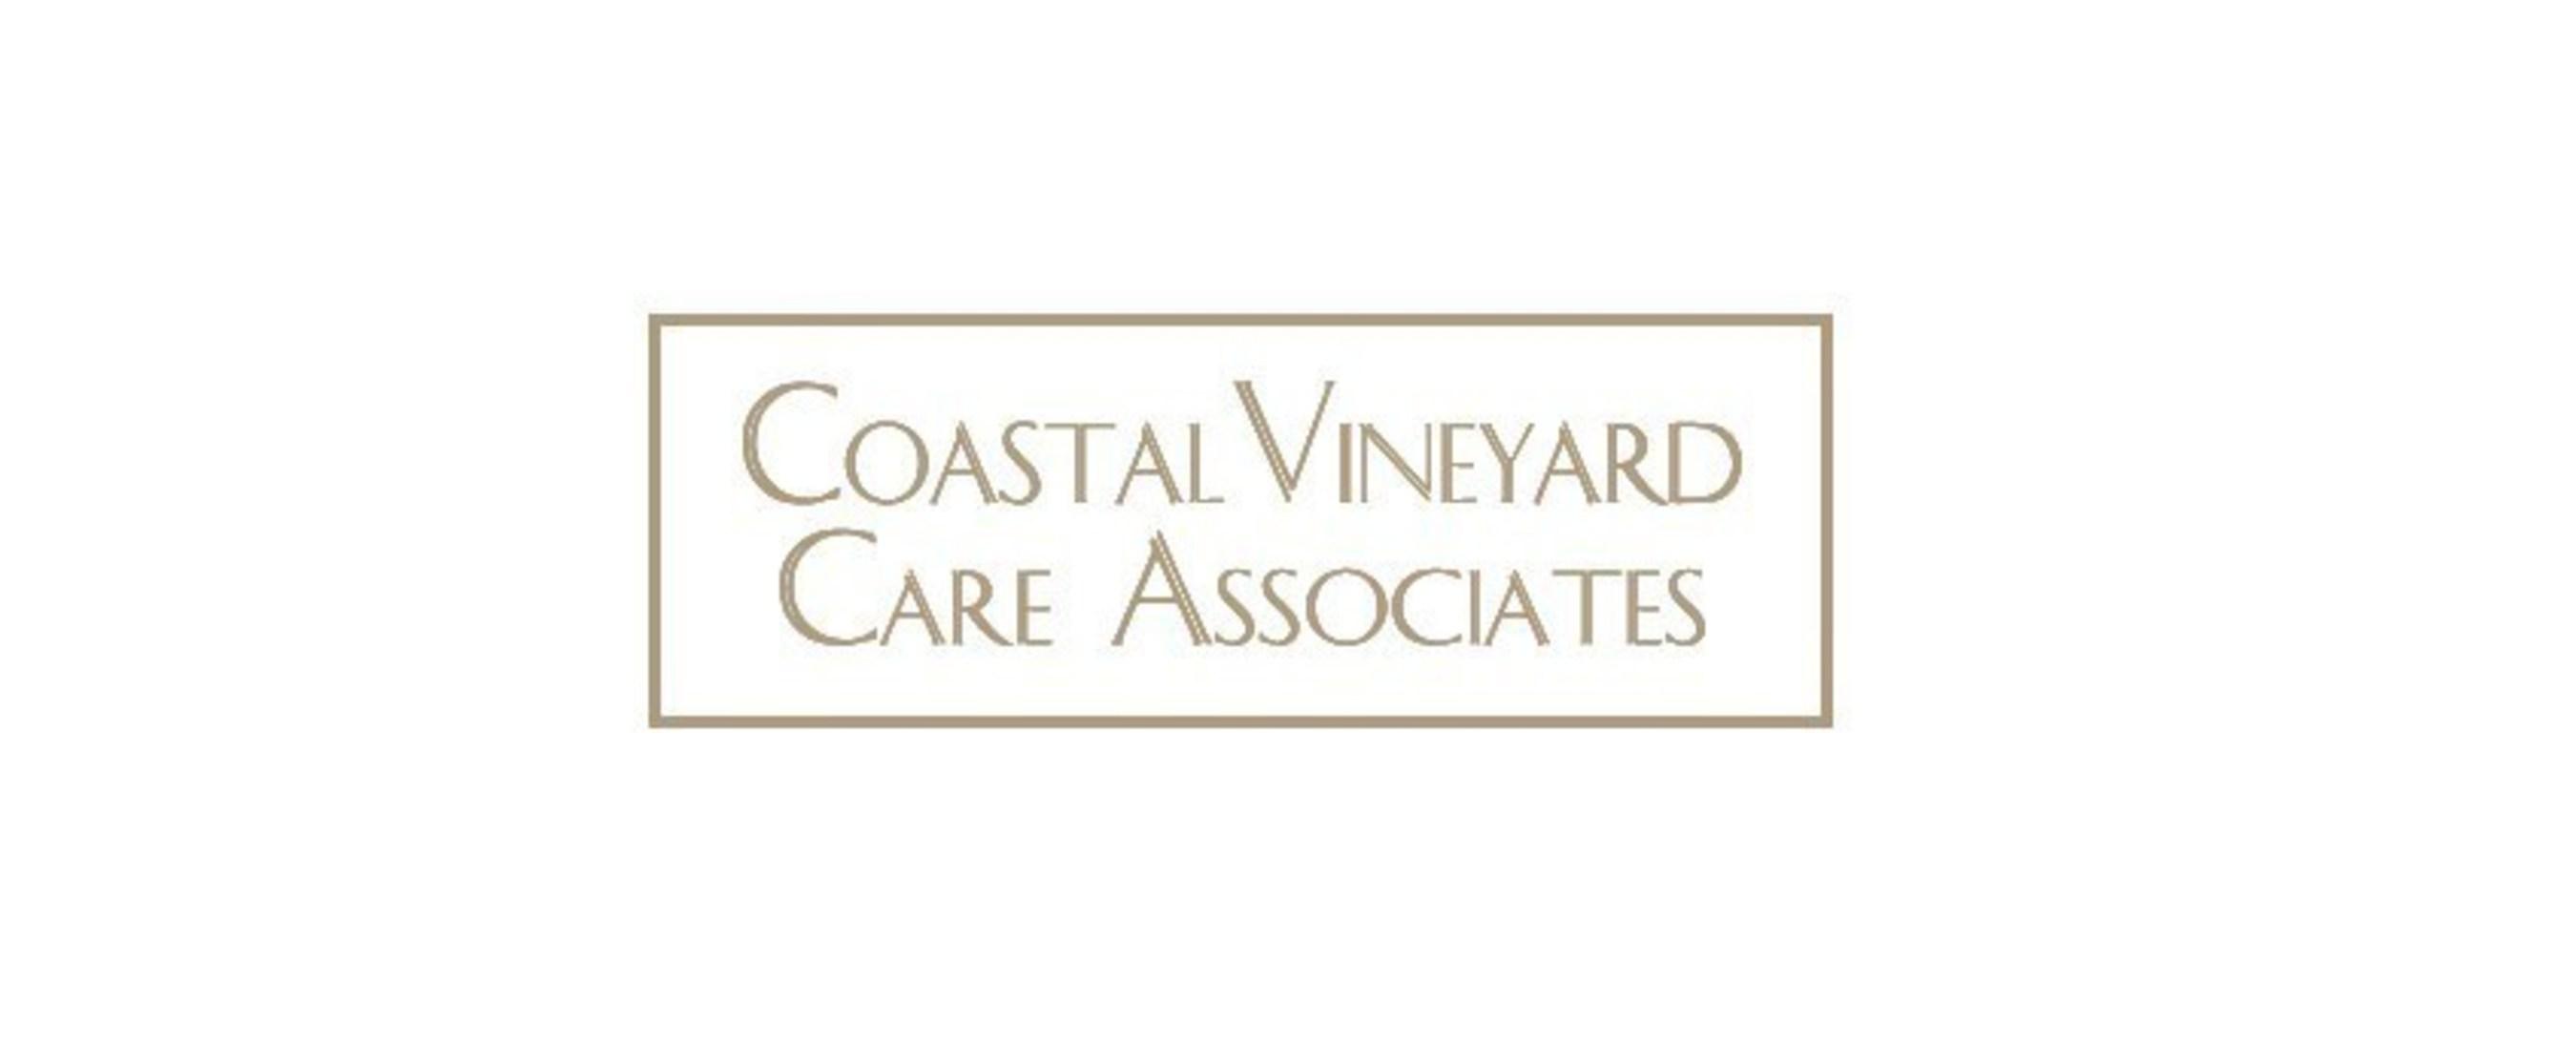 Coastal Vineyard Care Associates